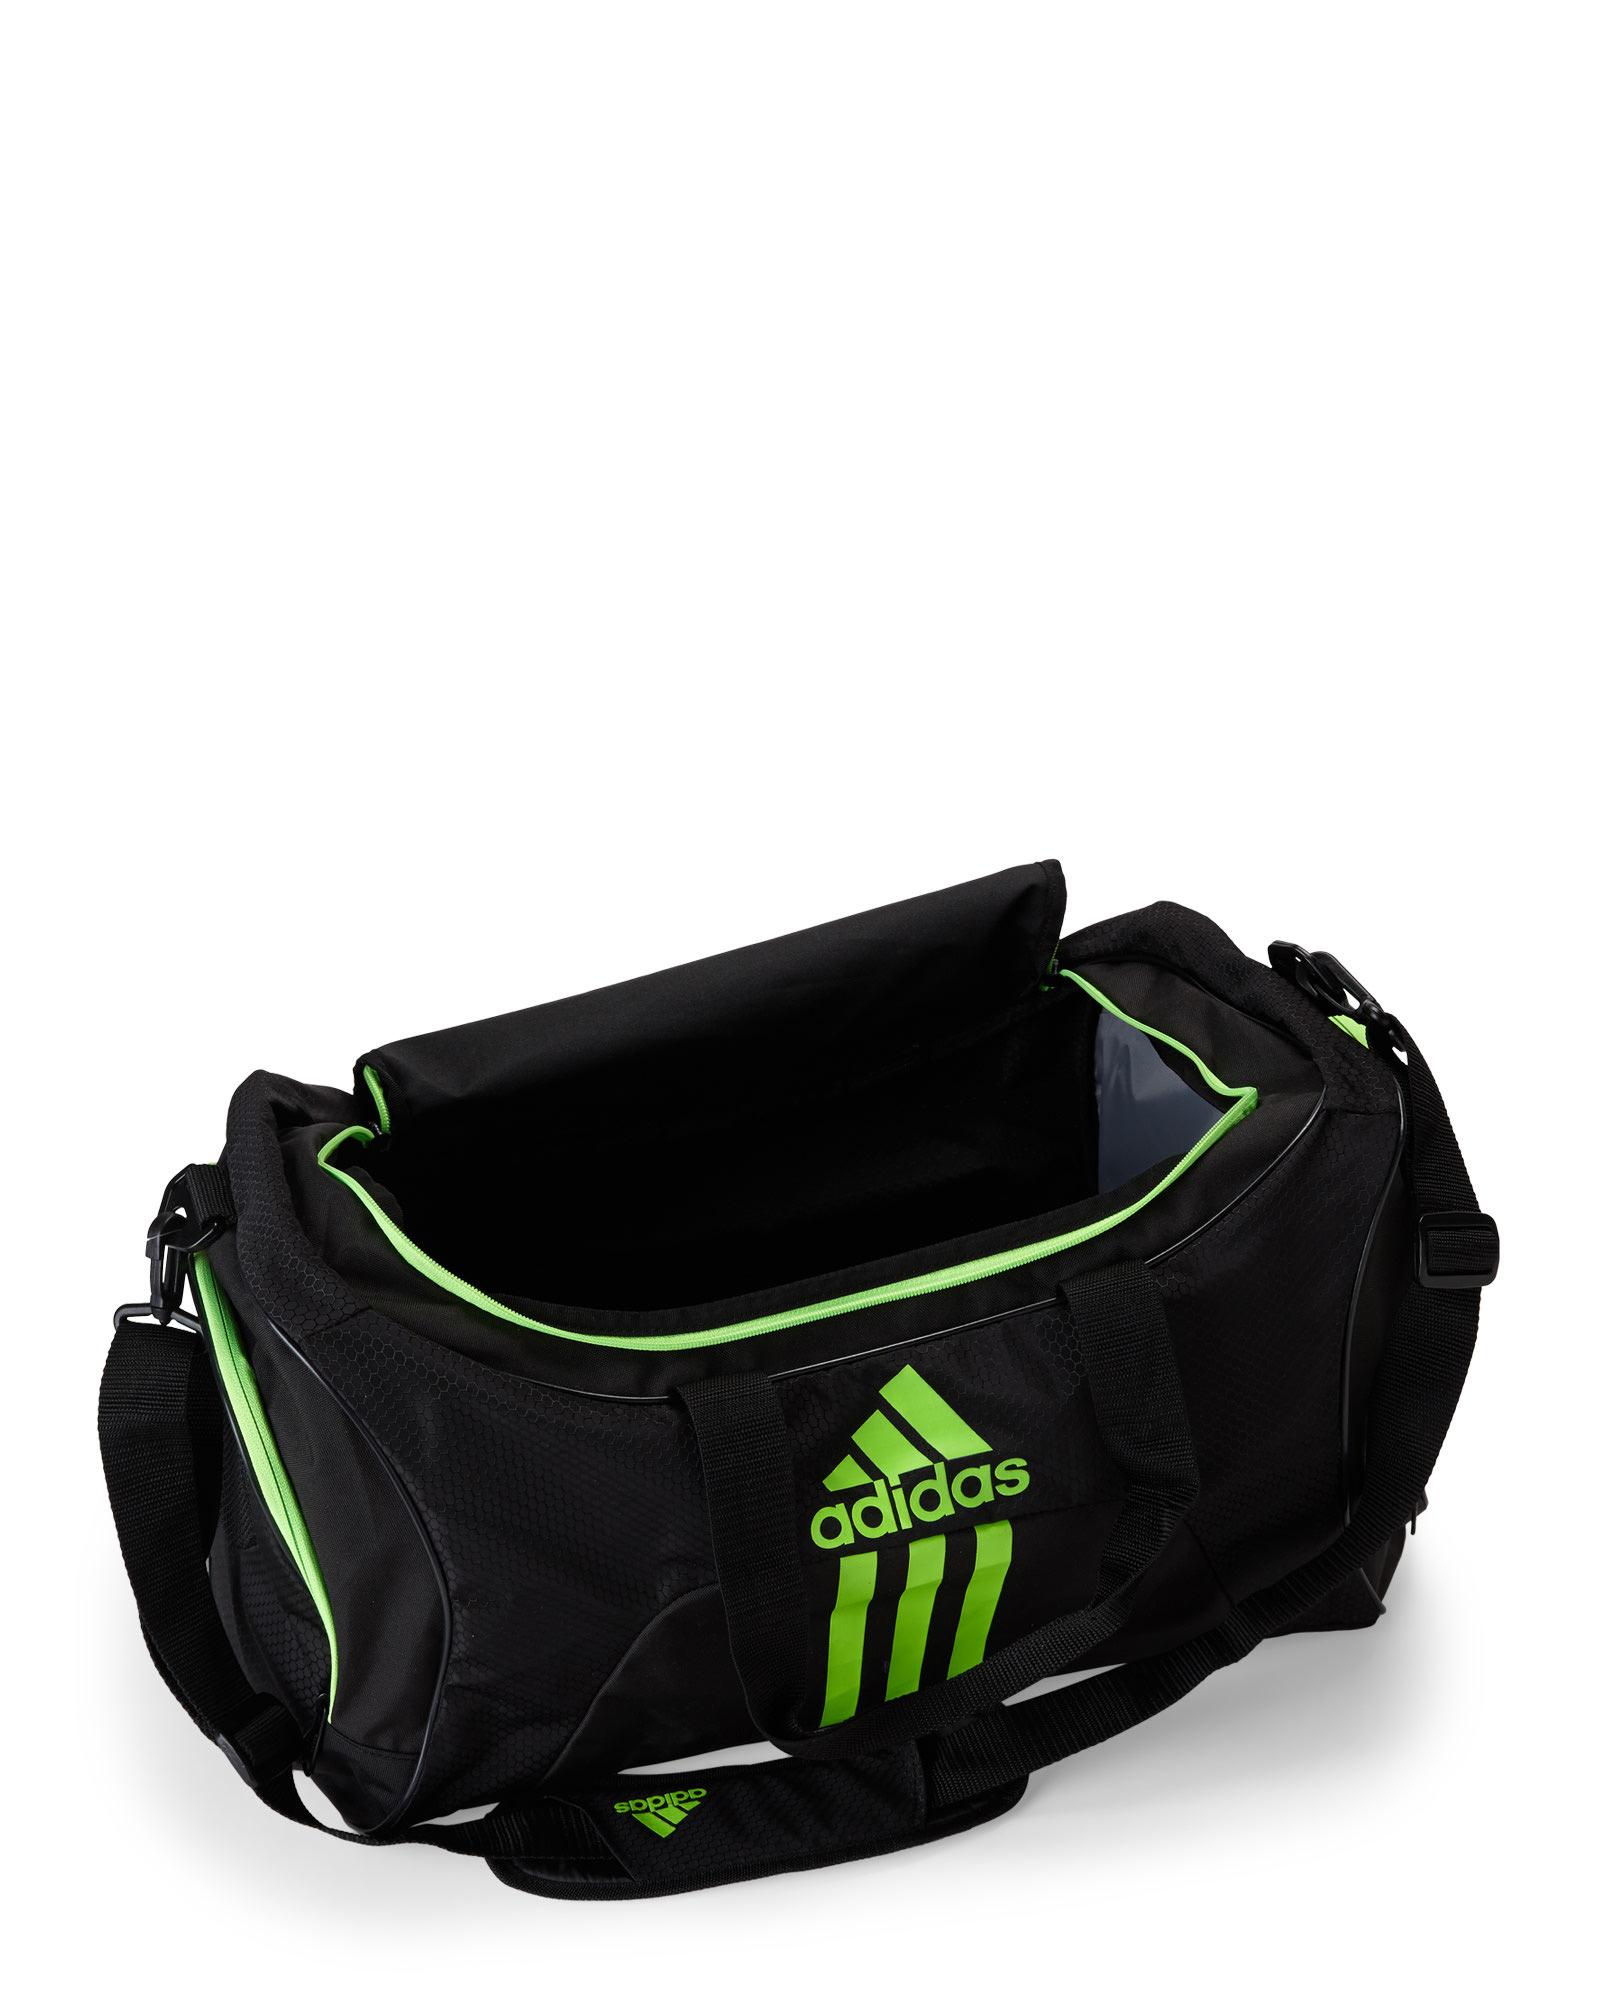 Lyst - adidas Originals Black   Green Scorer Medium Duffel in Black ... f14f7c53cc8c0